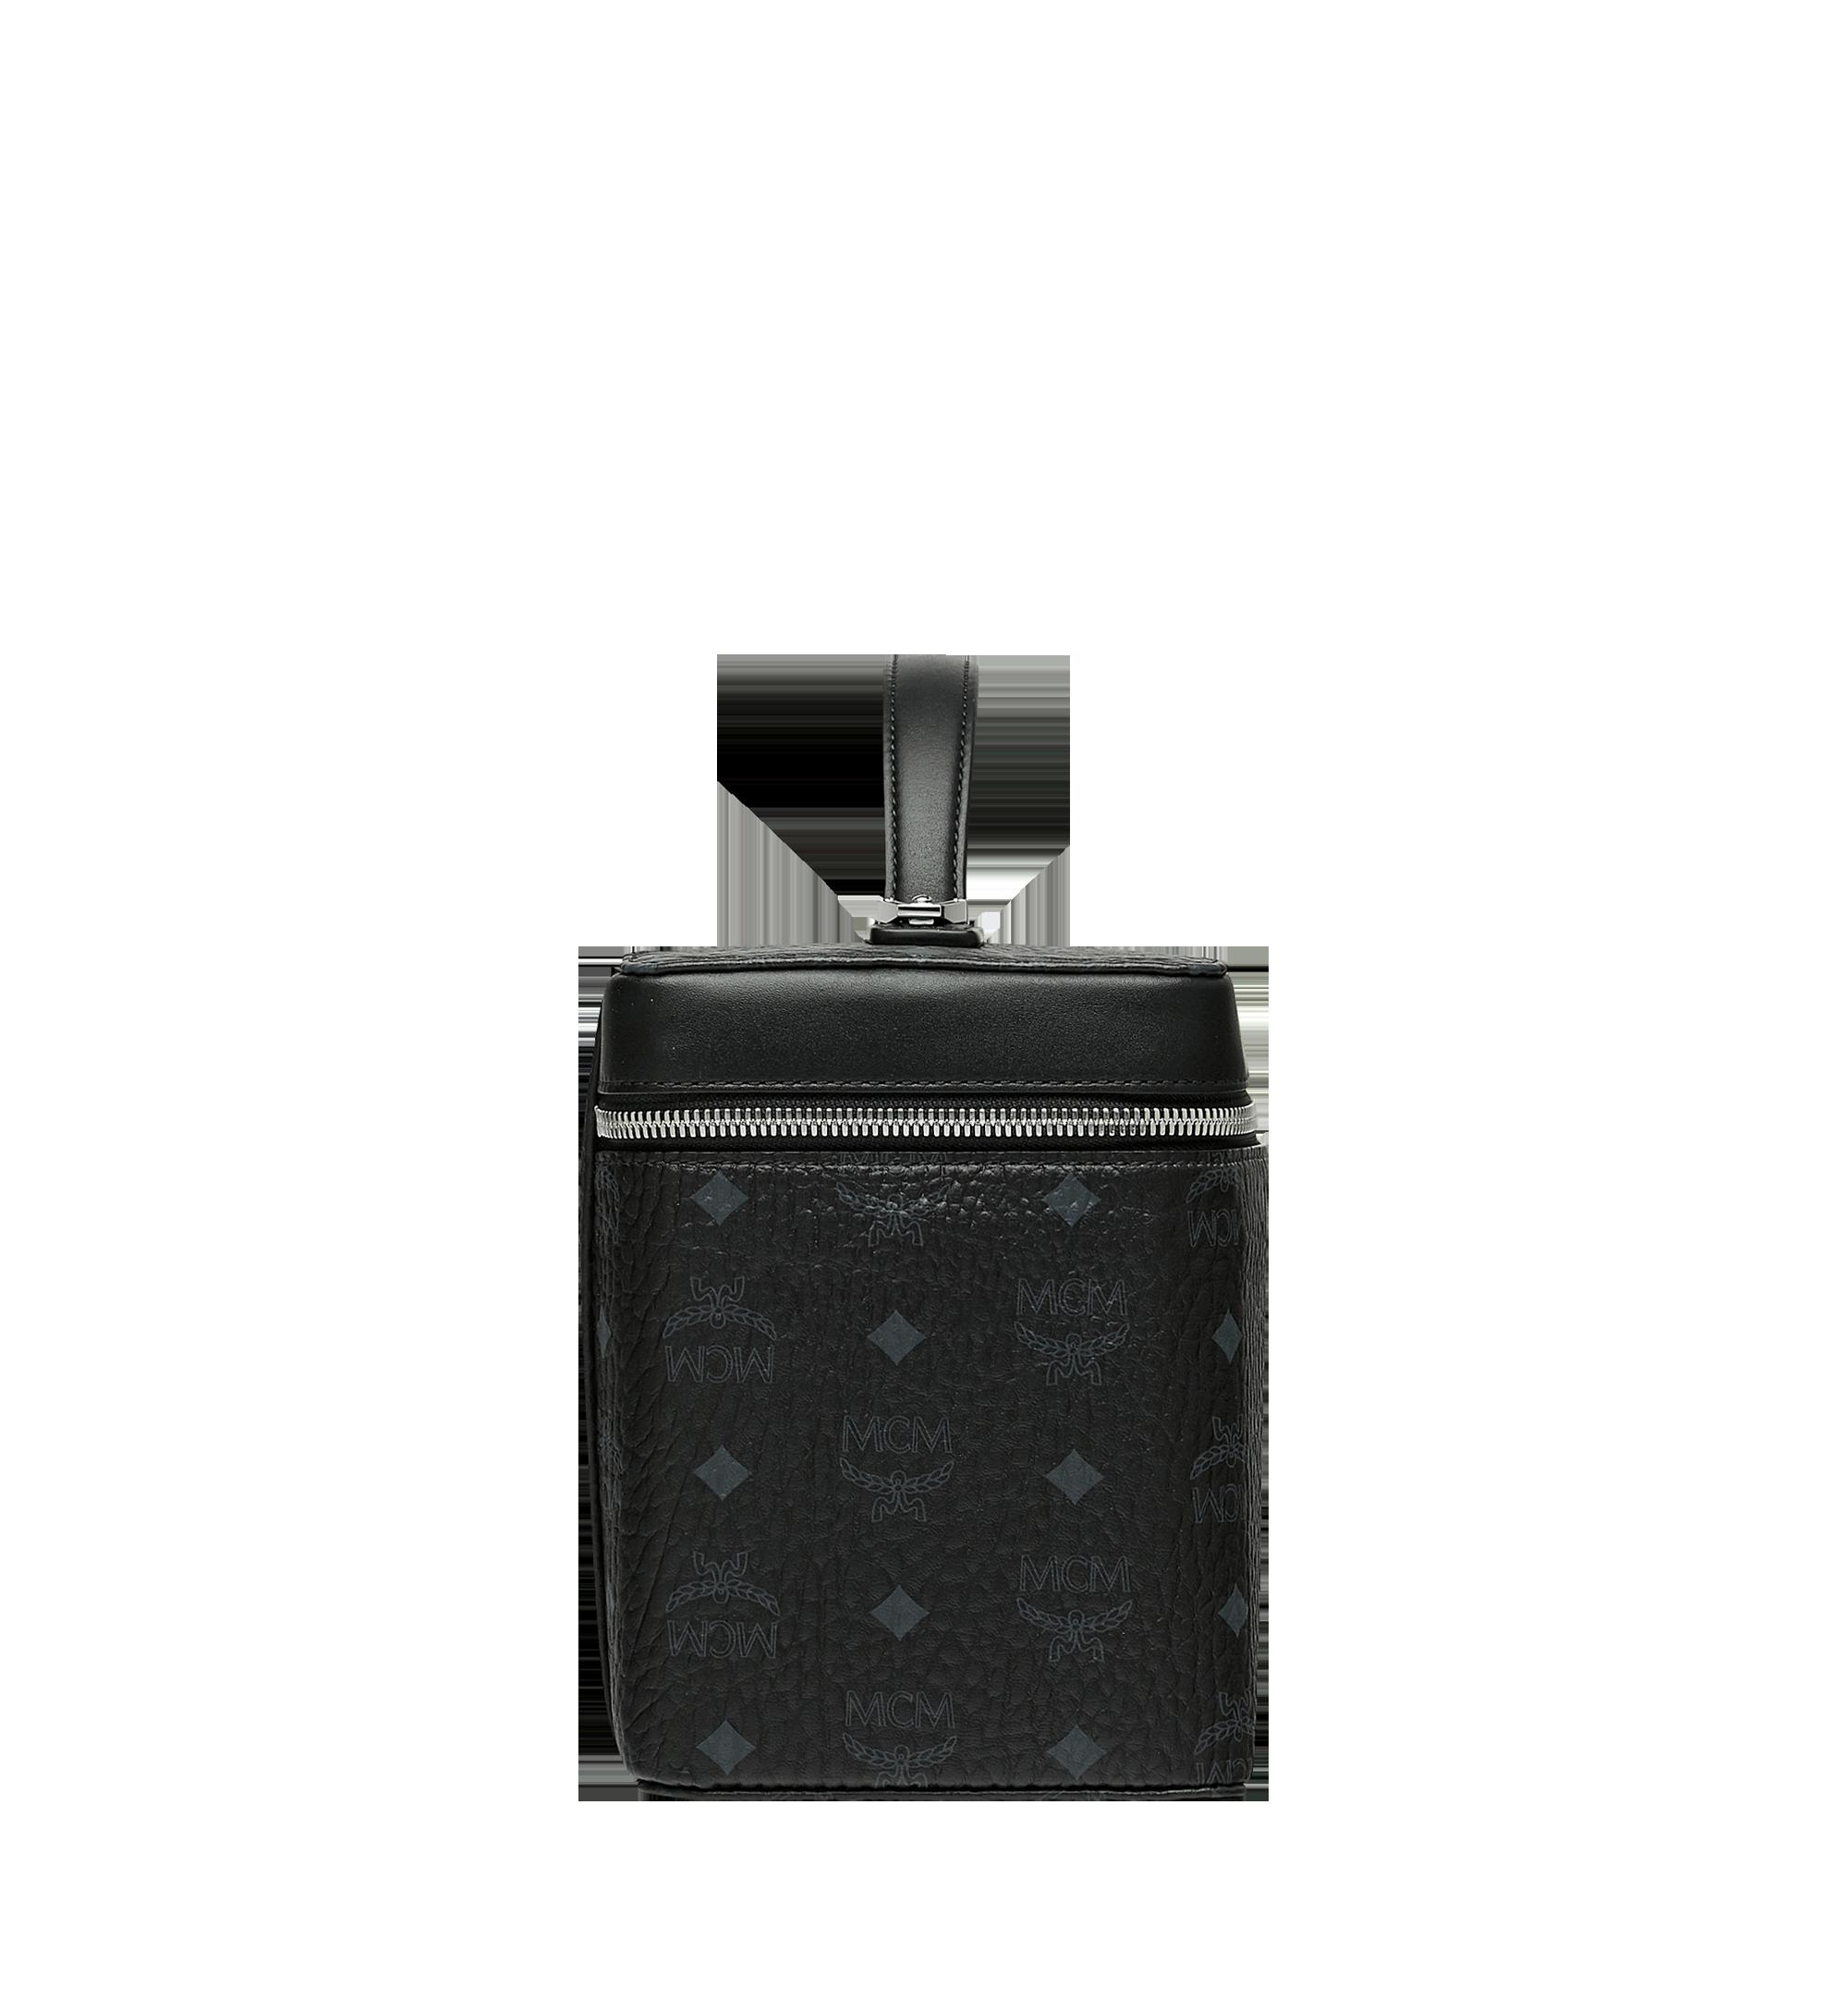 MCM Rockstar Vanity Case in Visetos Original Black MYZ9SVI96BK001 Alternate View 2